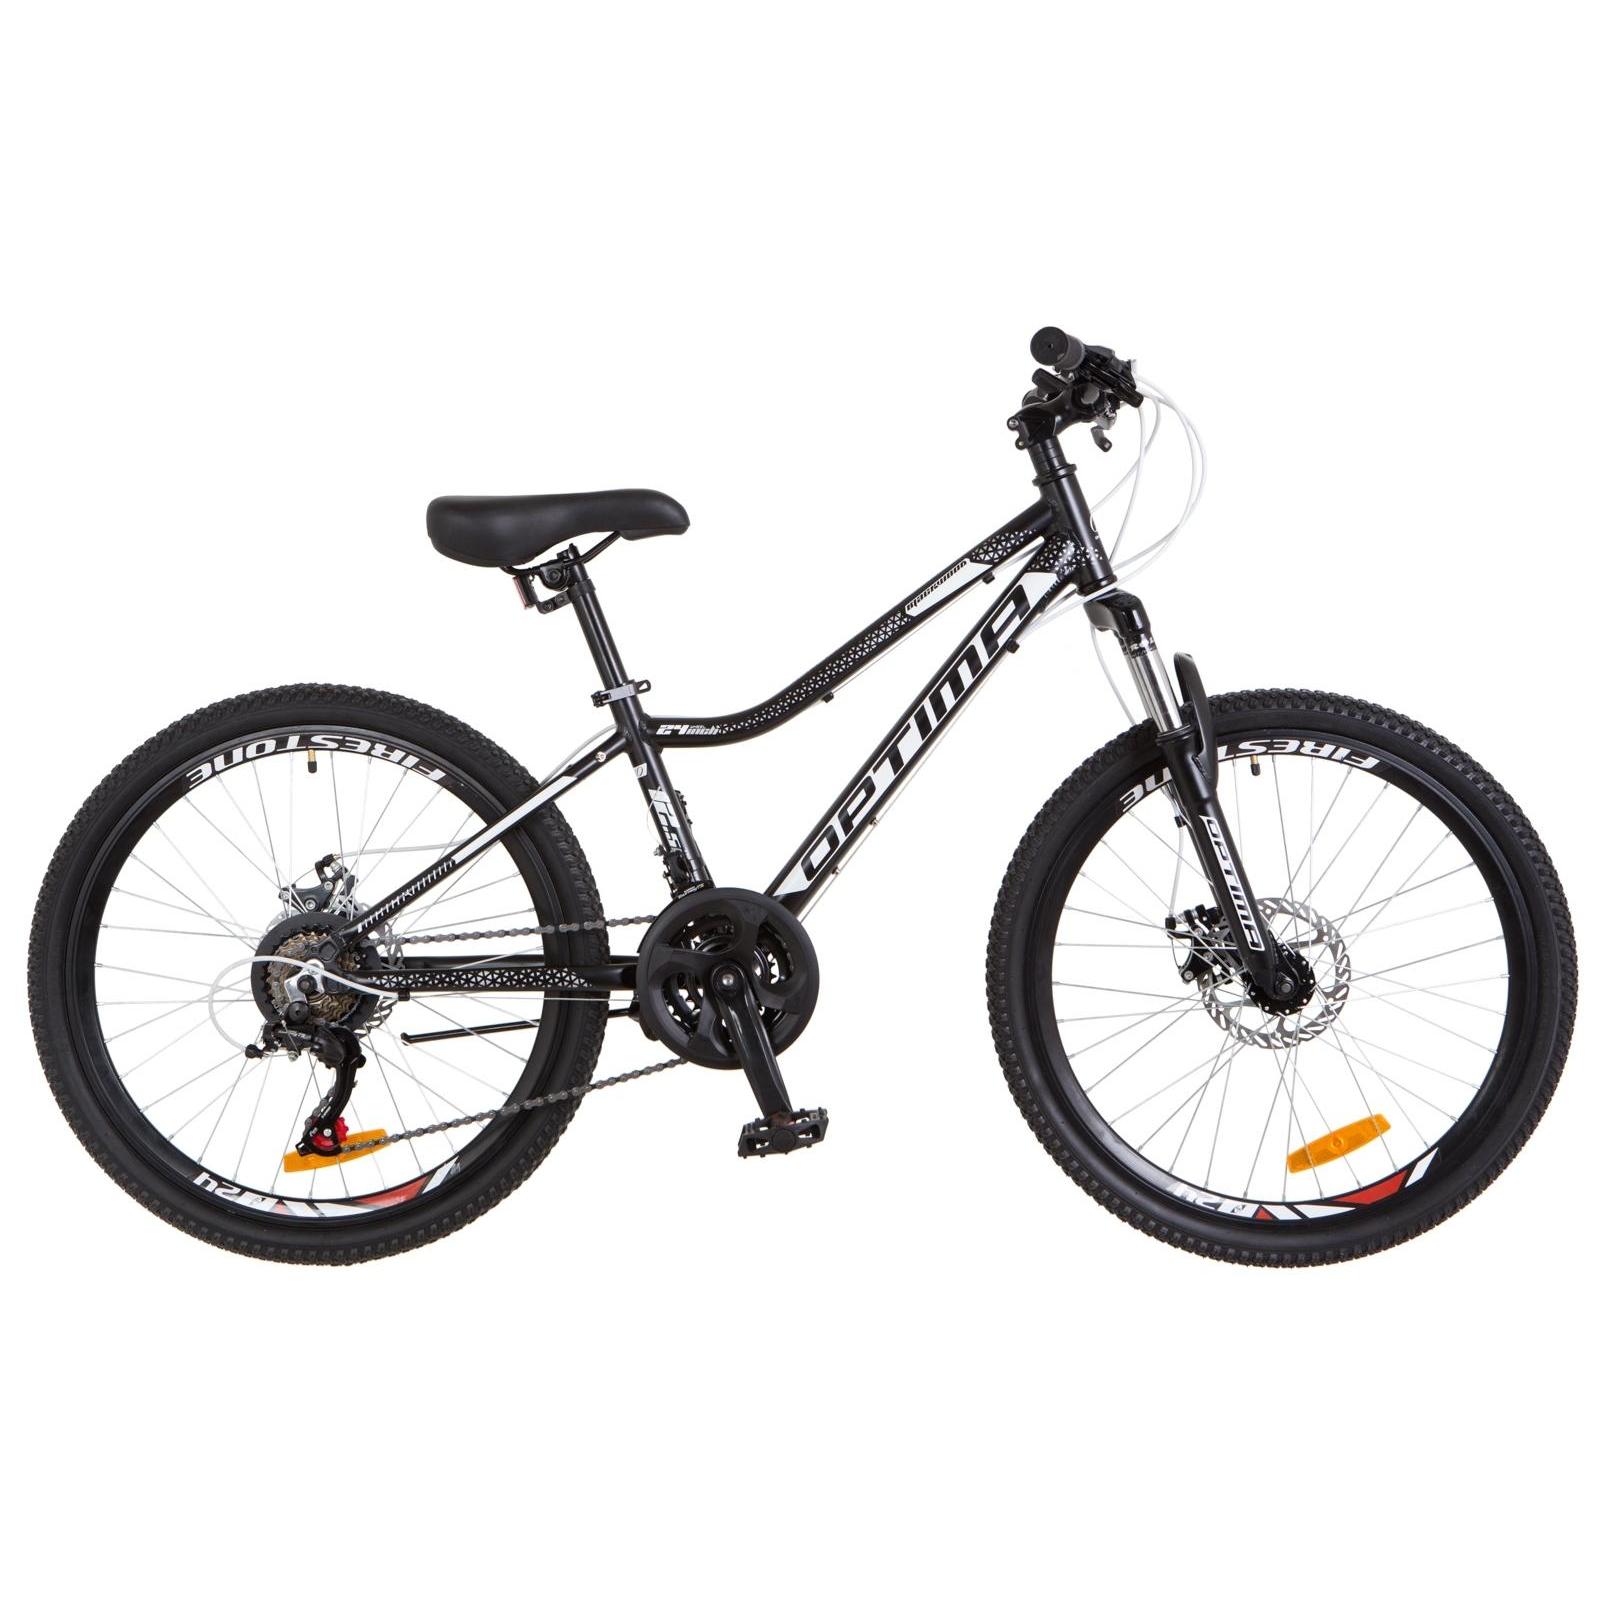 "Велосипед Optimabikes 24"" BLACKWOOD 2018 AM 14G DD рама-12,5"" Al черно-белый (OPS-OP-24-031)"